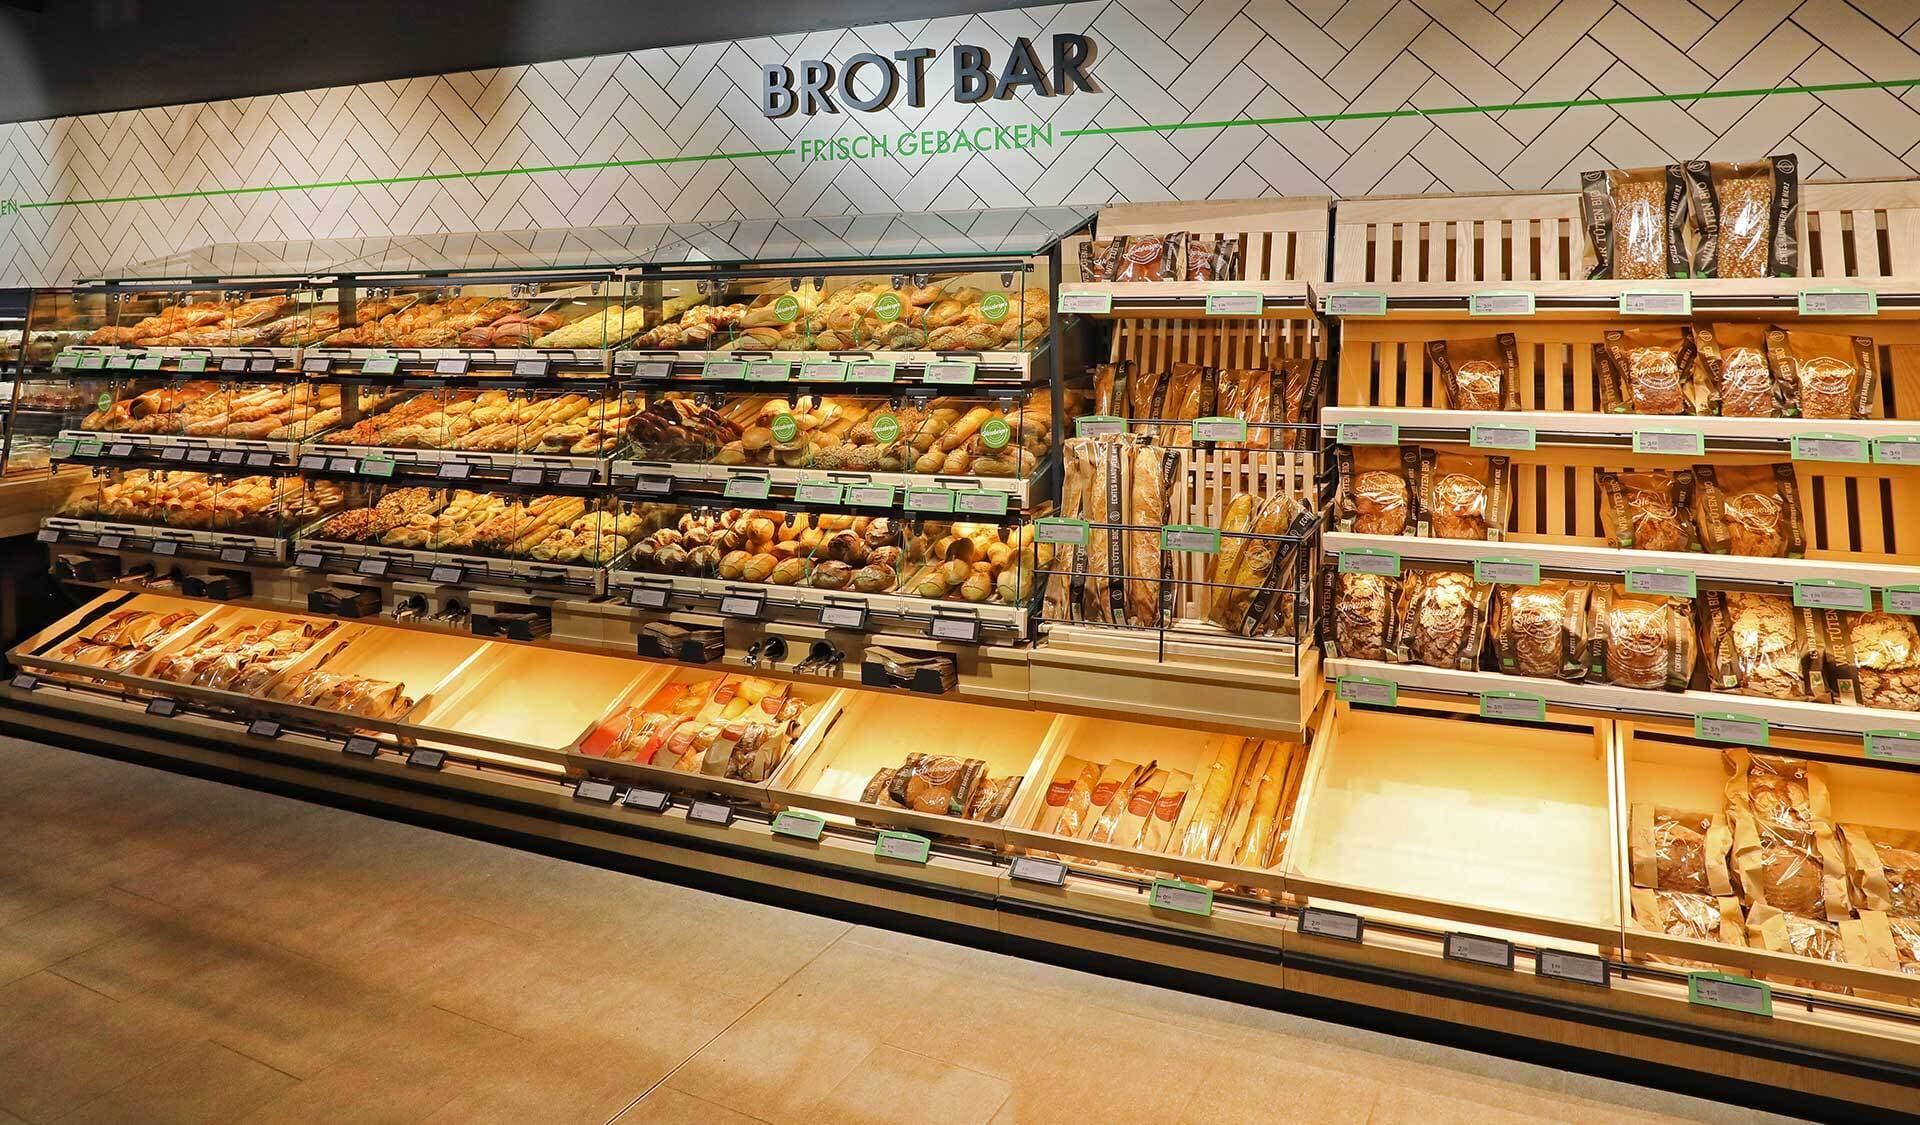 Tegut Quartier Brot Bar